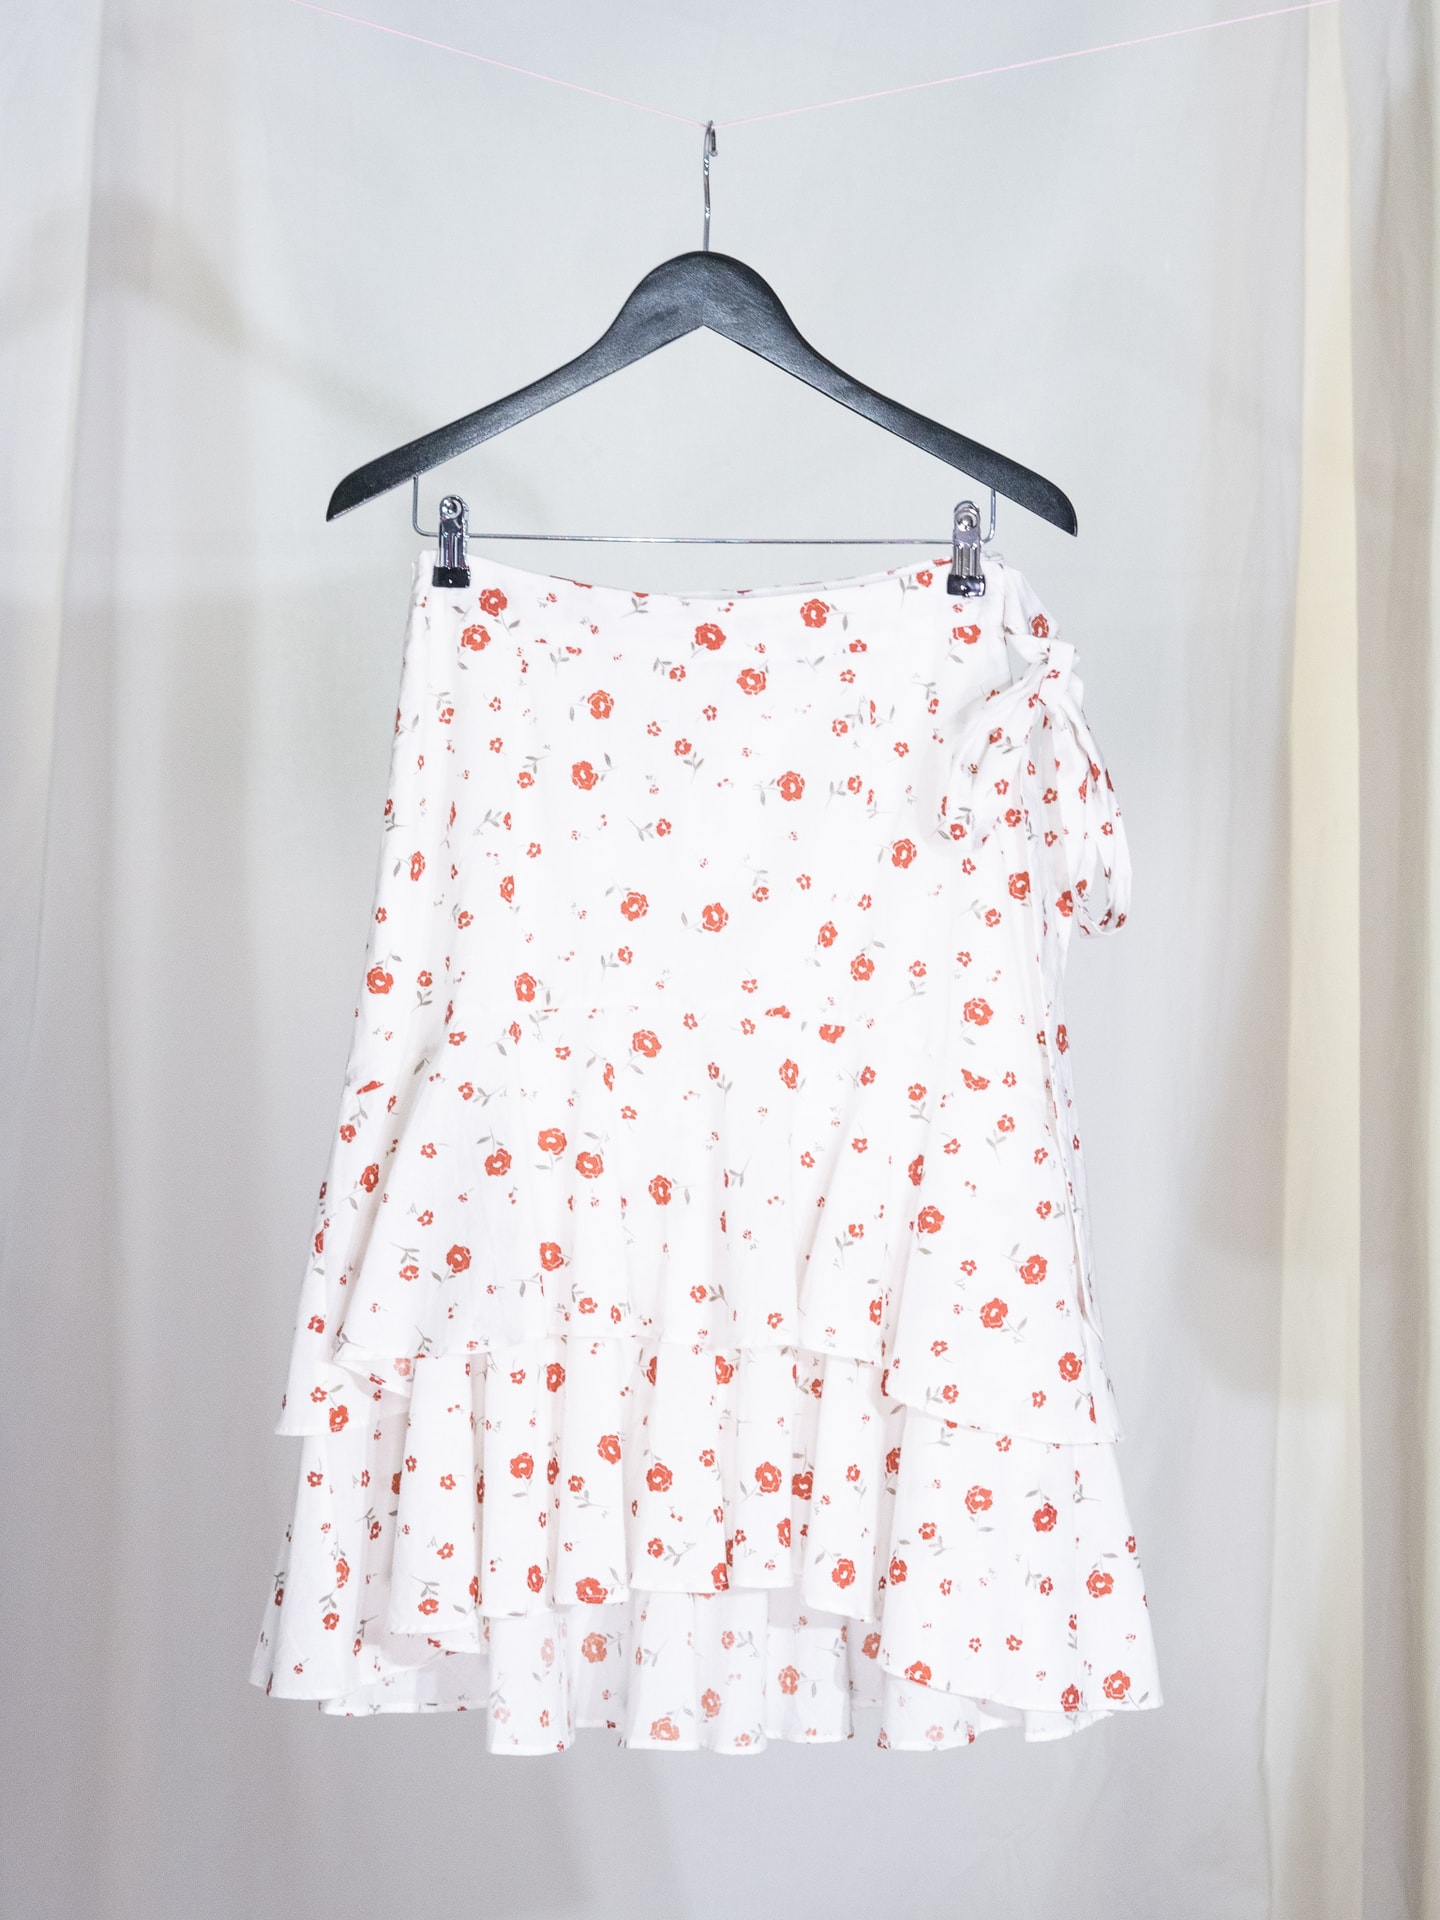 Oda skirt